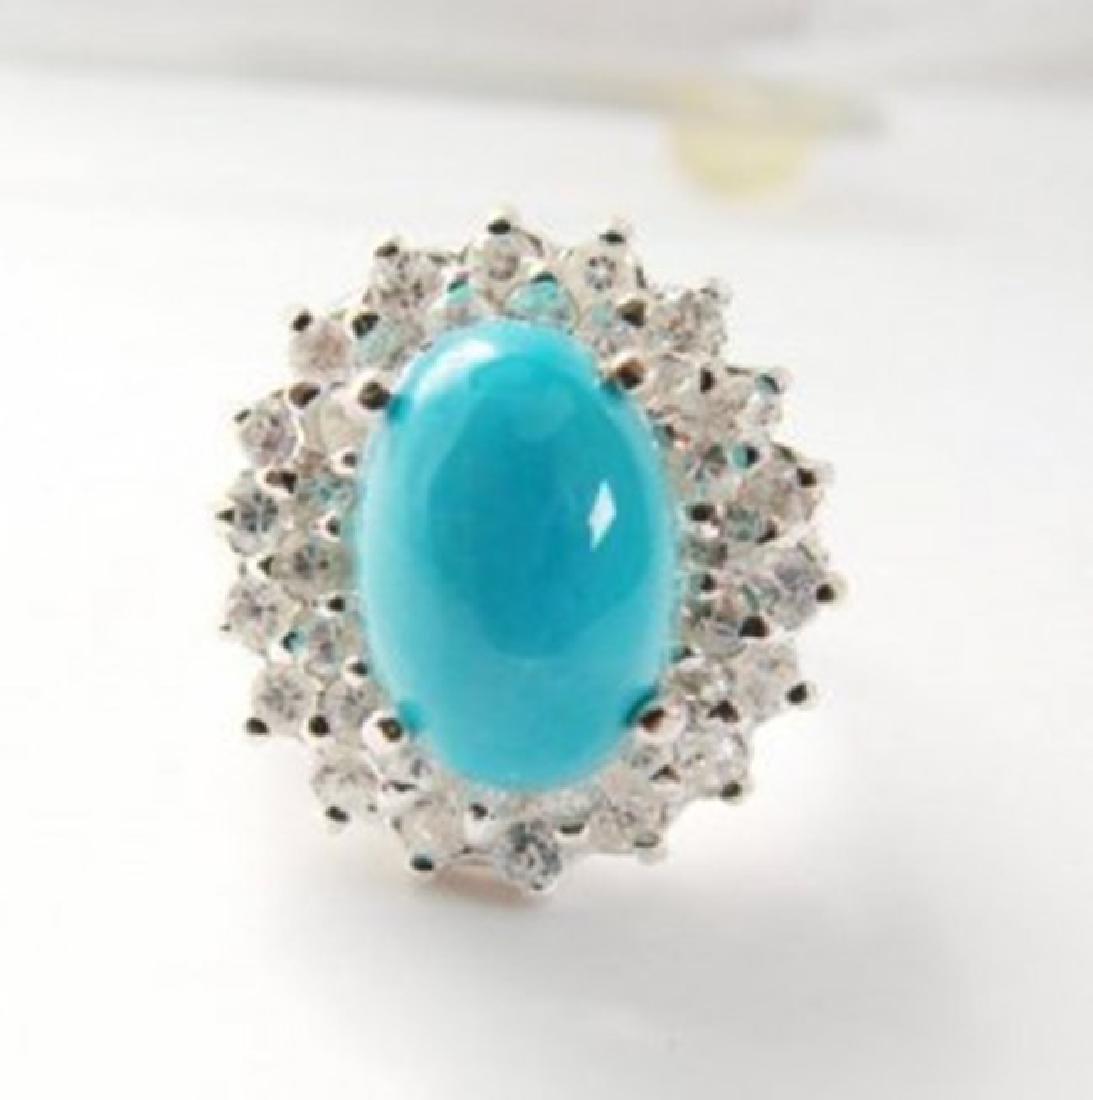 Natural Turquoise Diamond Ring 5.22Ct 14k W/g